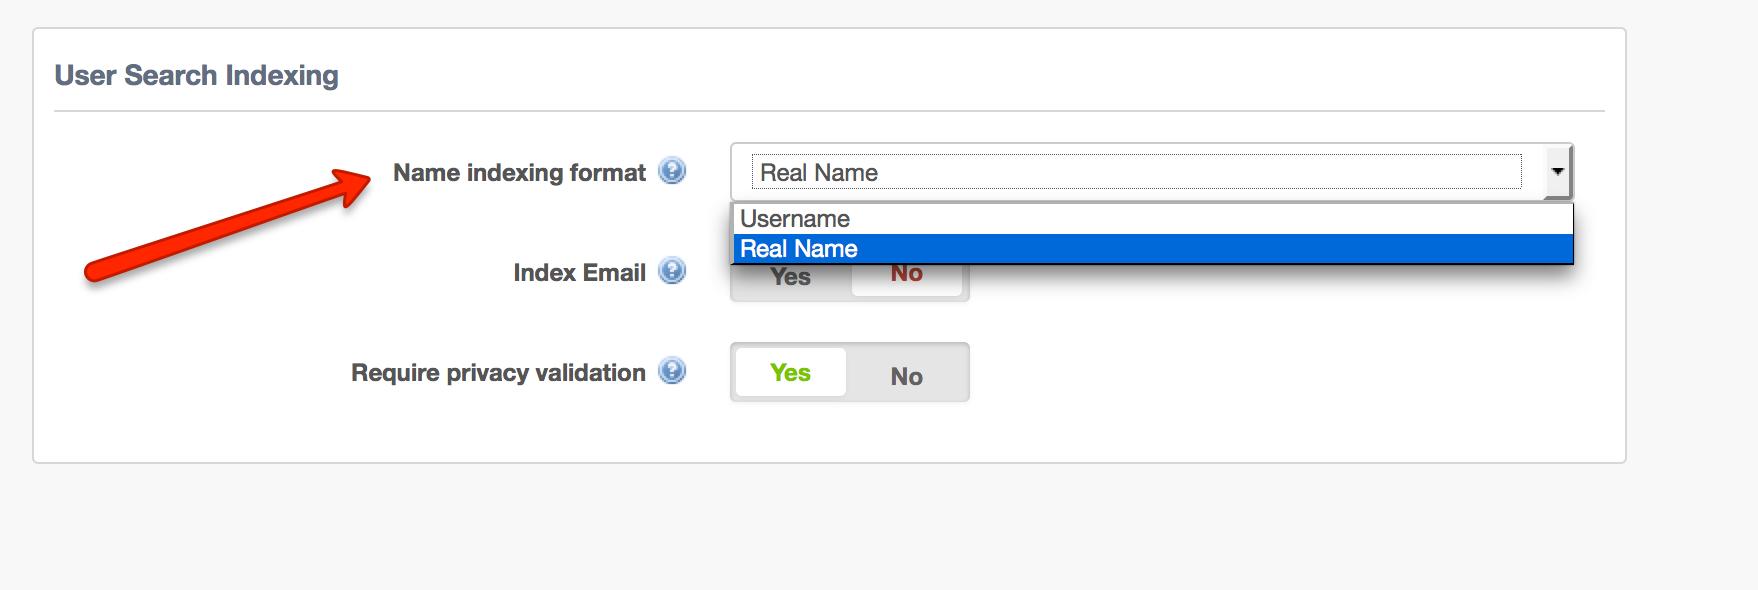 Configuring User Search Behavior